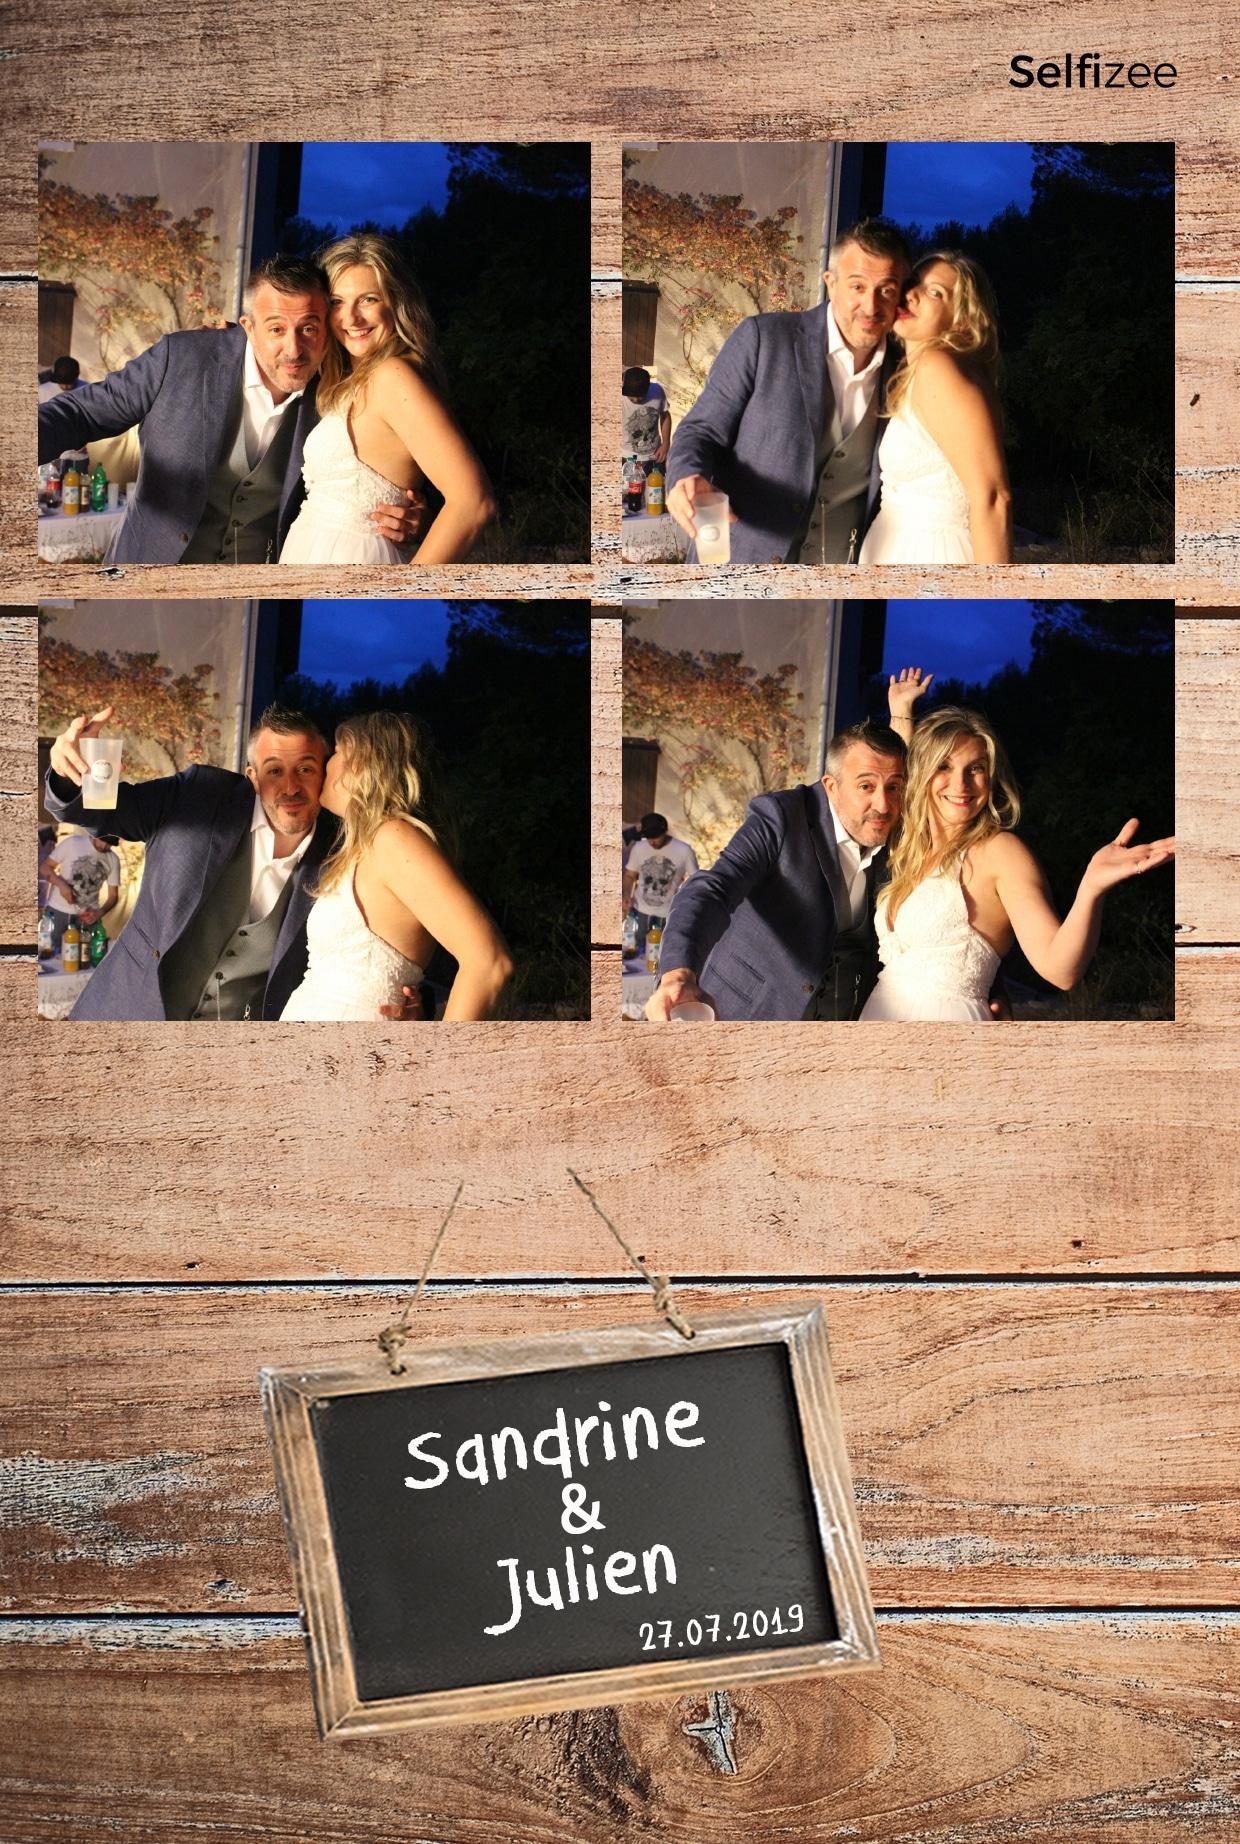 Animation photobooth mariage Marseille - location borne photo mariage Marseille et Bouches du Rhône avec impressions selfies